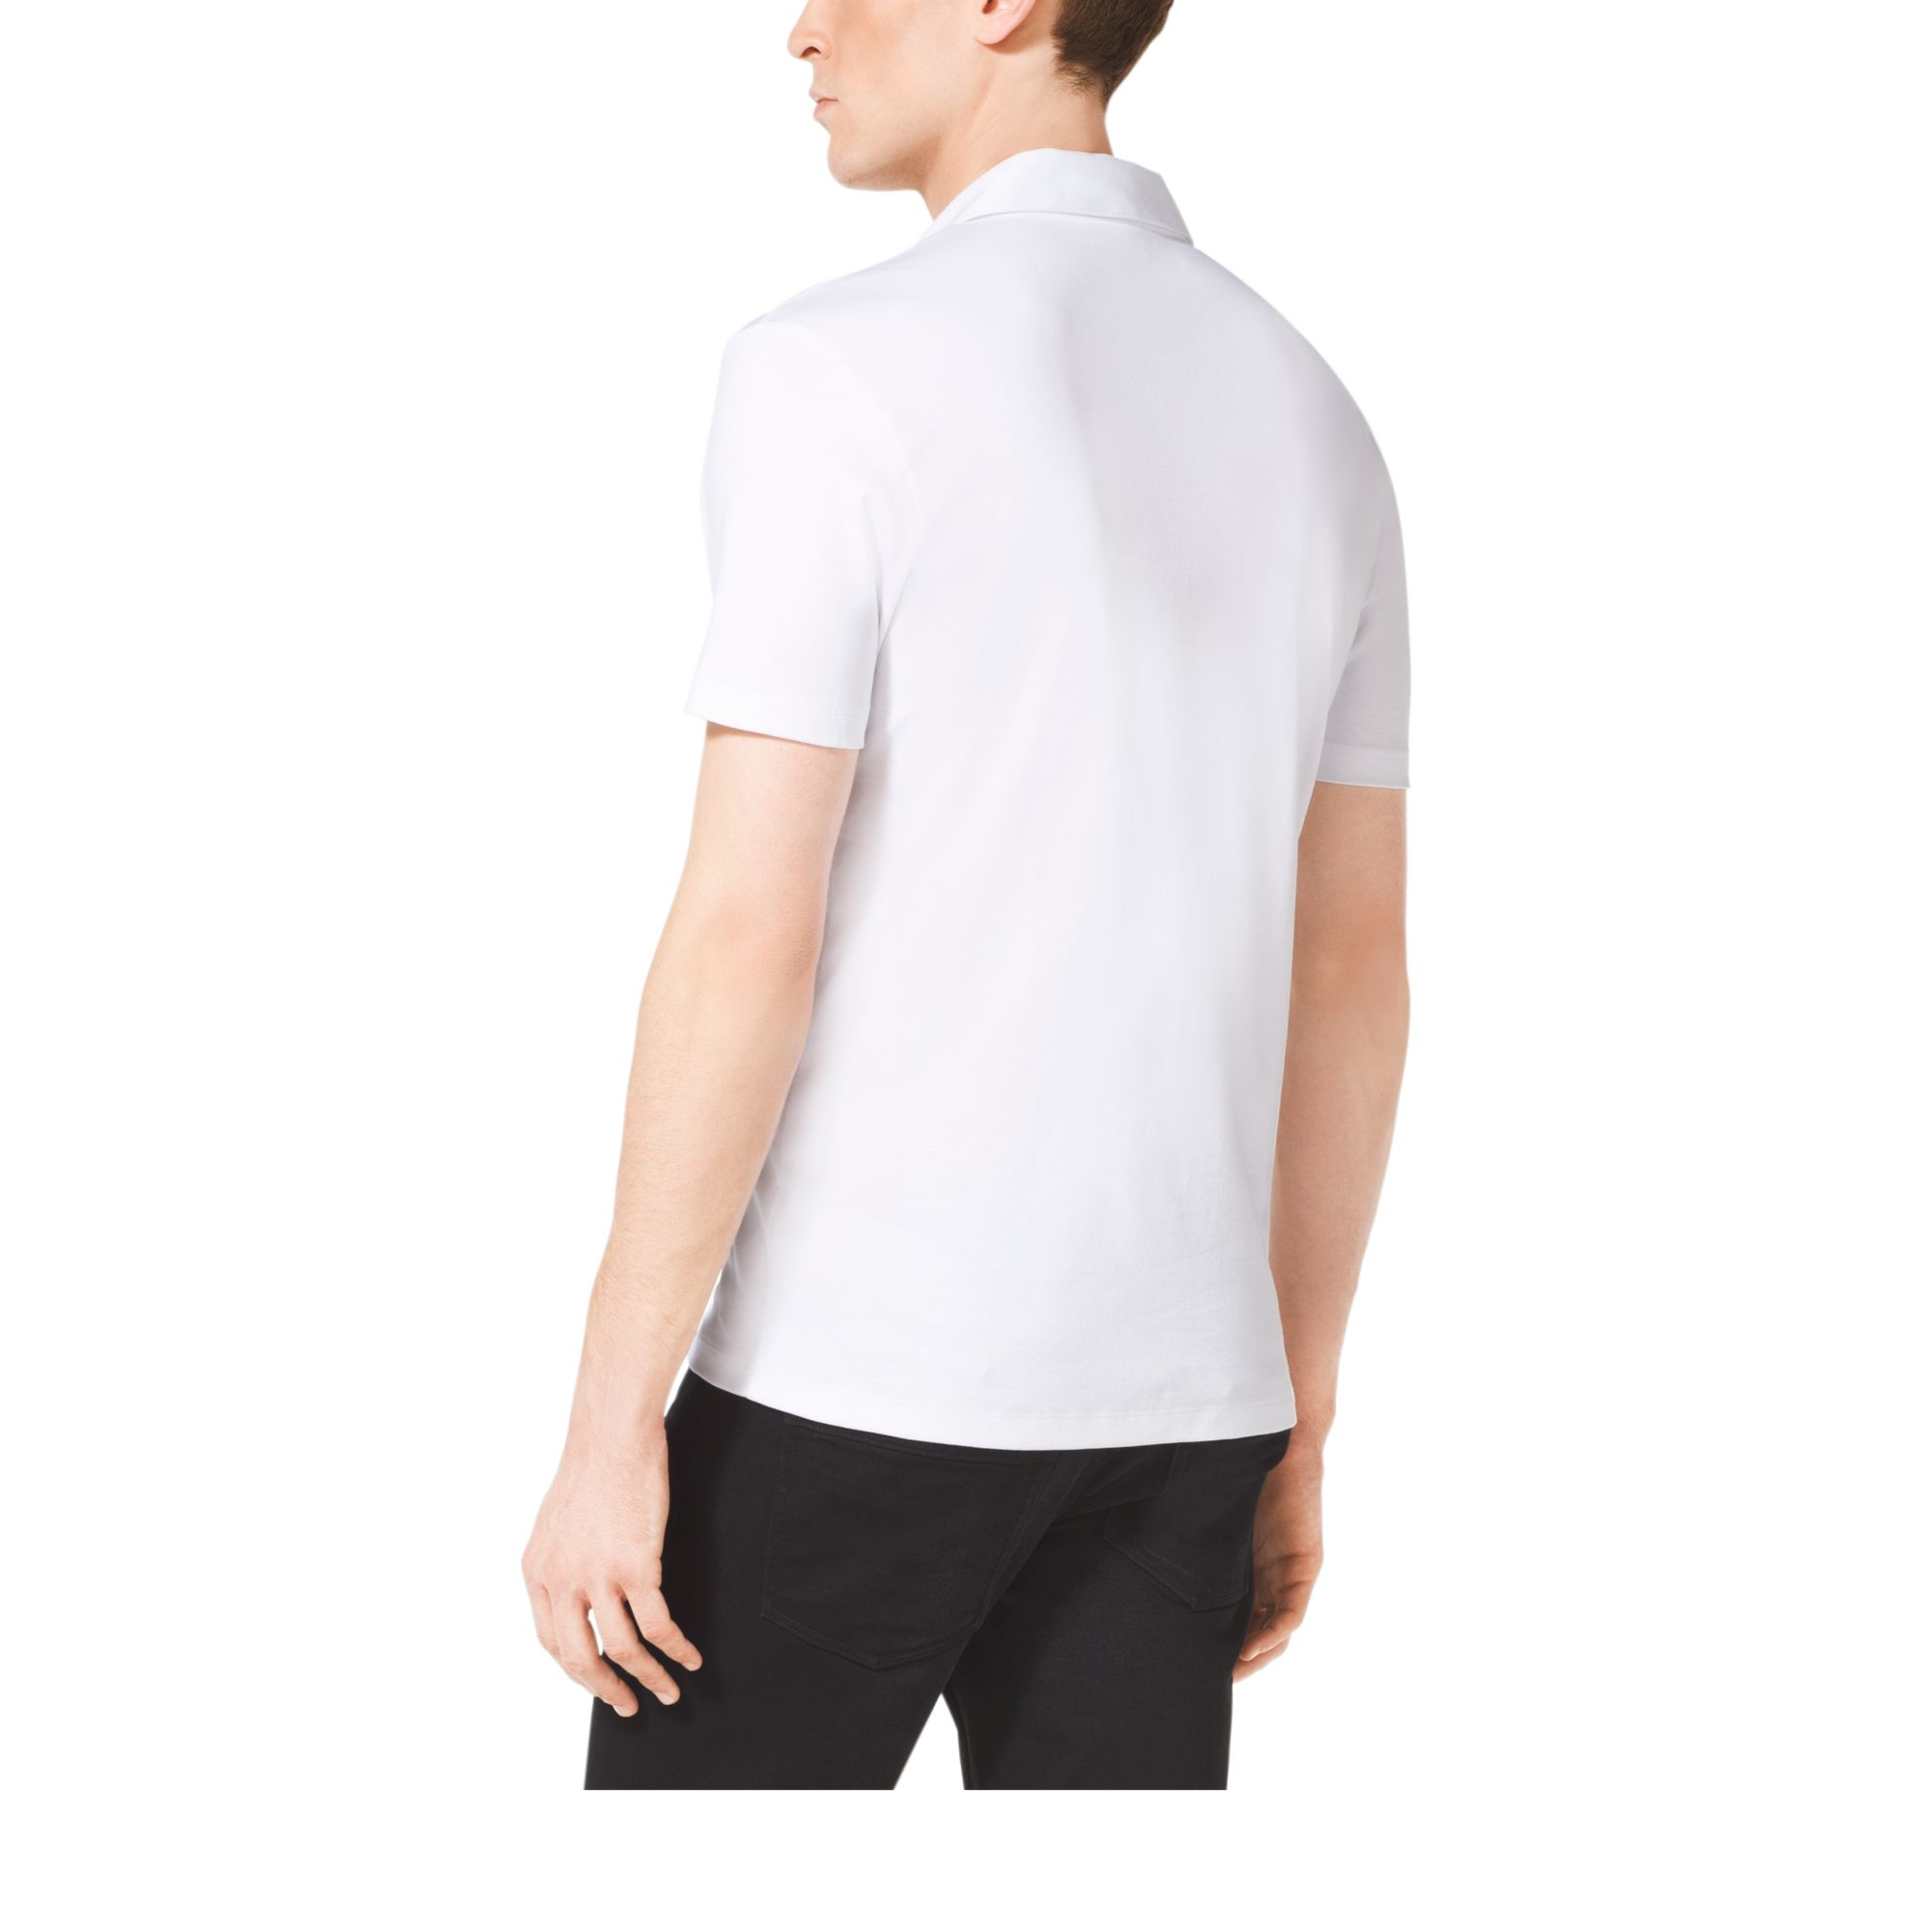 michael kors cotton polo shirt in white for men lyst. Black Bedroom Furniture Sets. Home Design Ideas